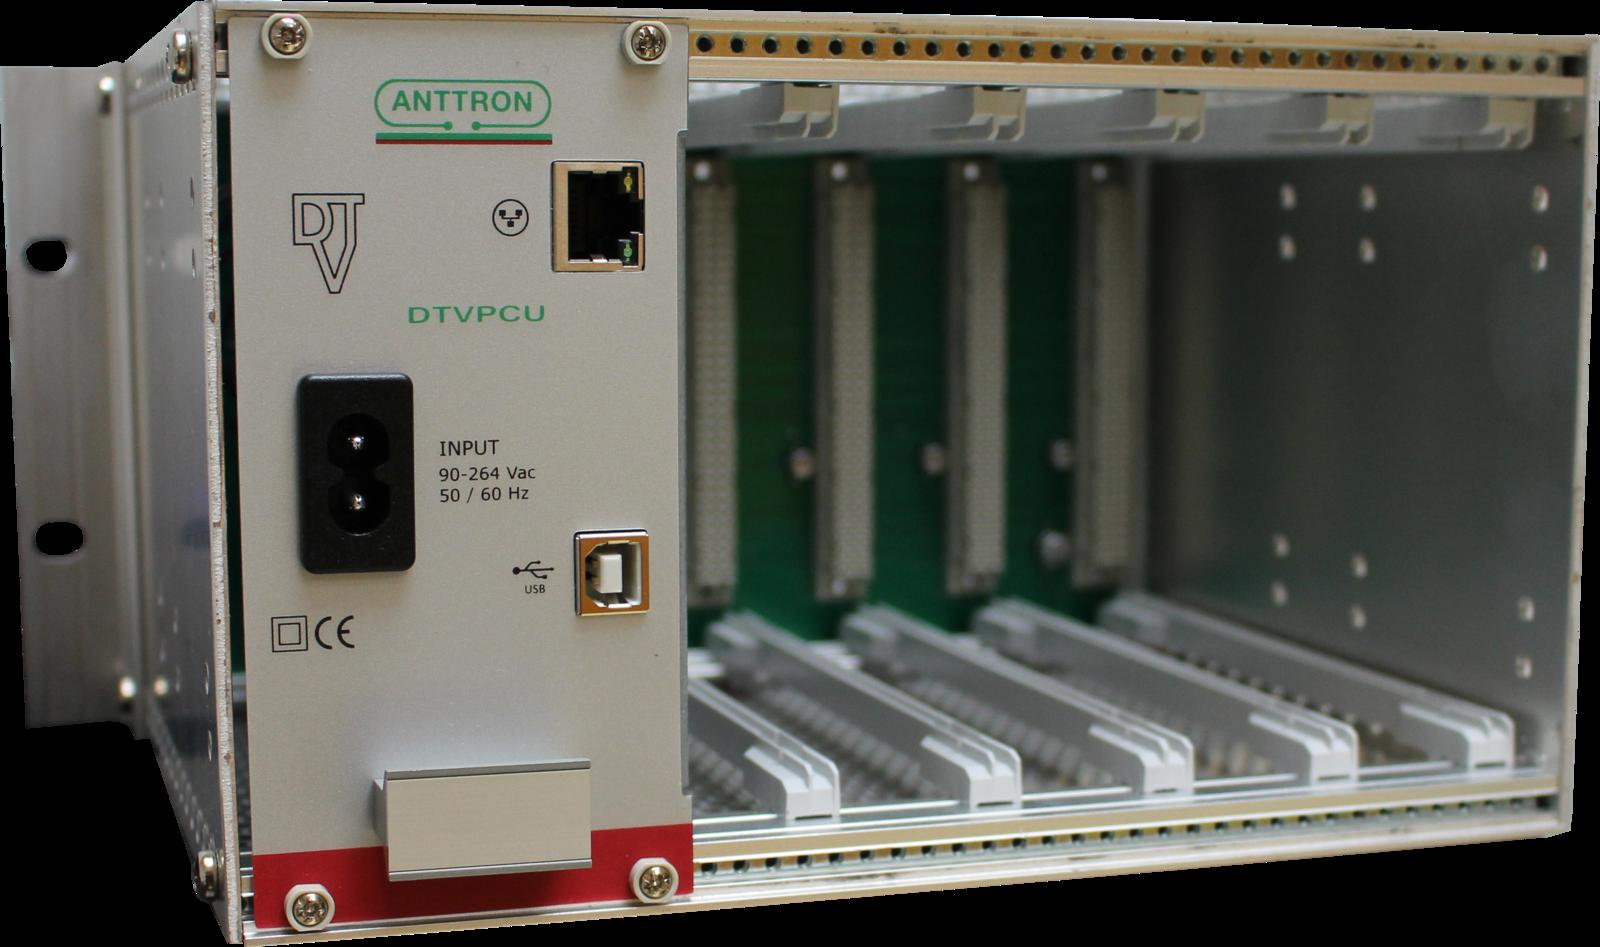 Anttron Semi rack for 5 modules Wall mount Powersupply : 45 Watt - Approx 1-3 working day lead.